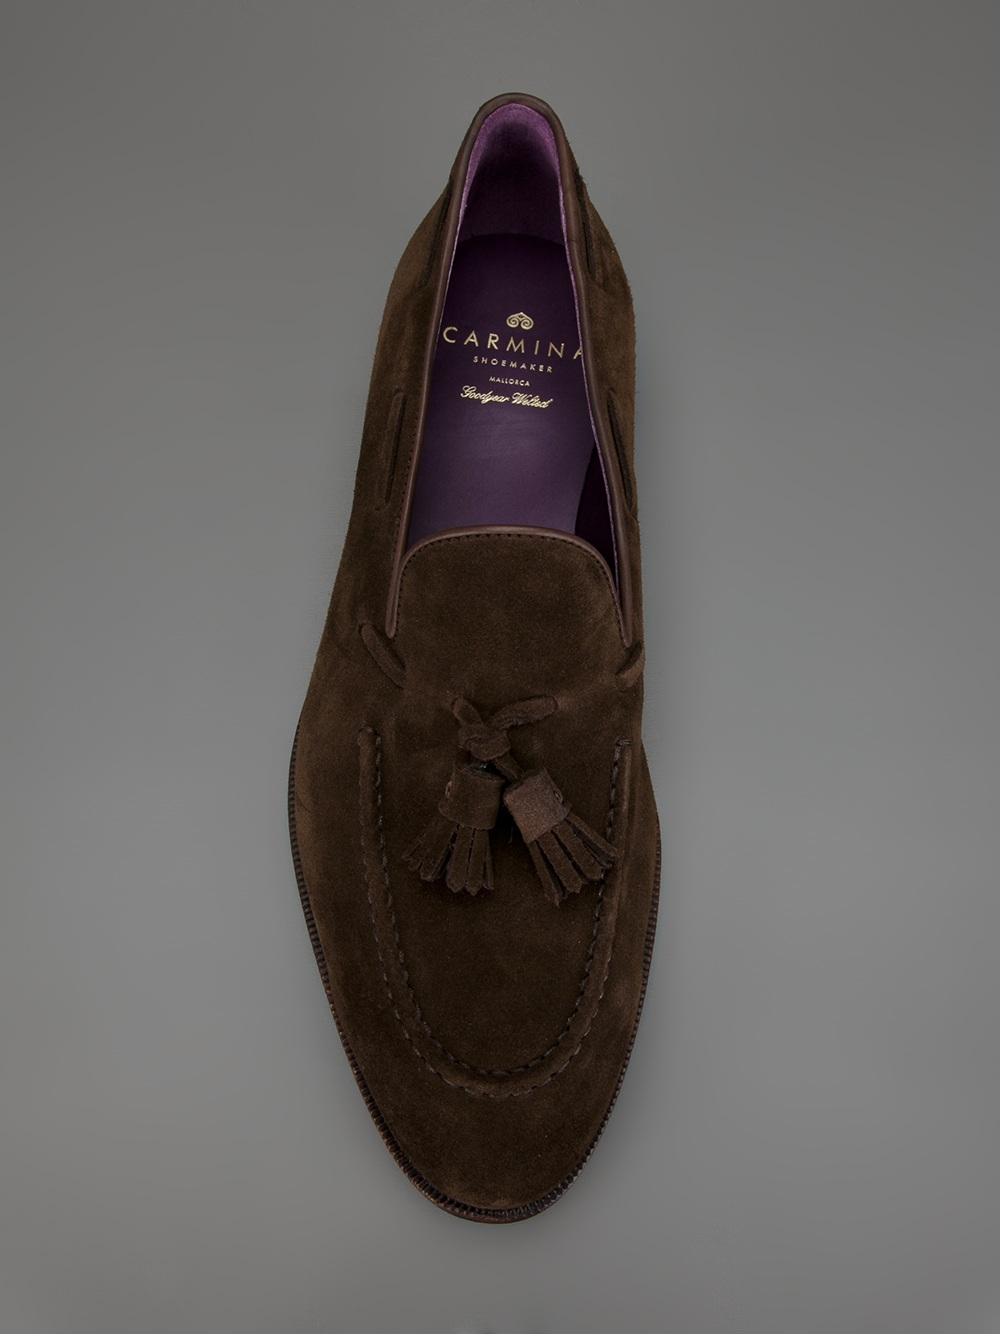 ca82ccb01f7 Lyst - Carmina Shoemaker Tassel Loafer in Brown for Men